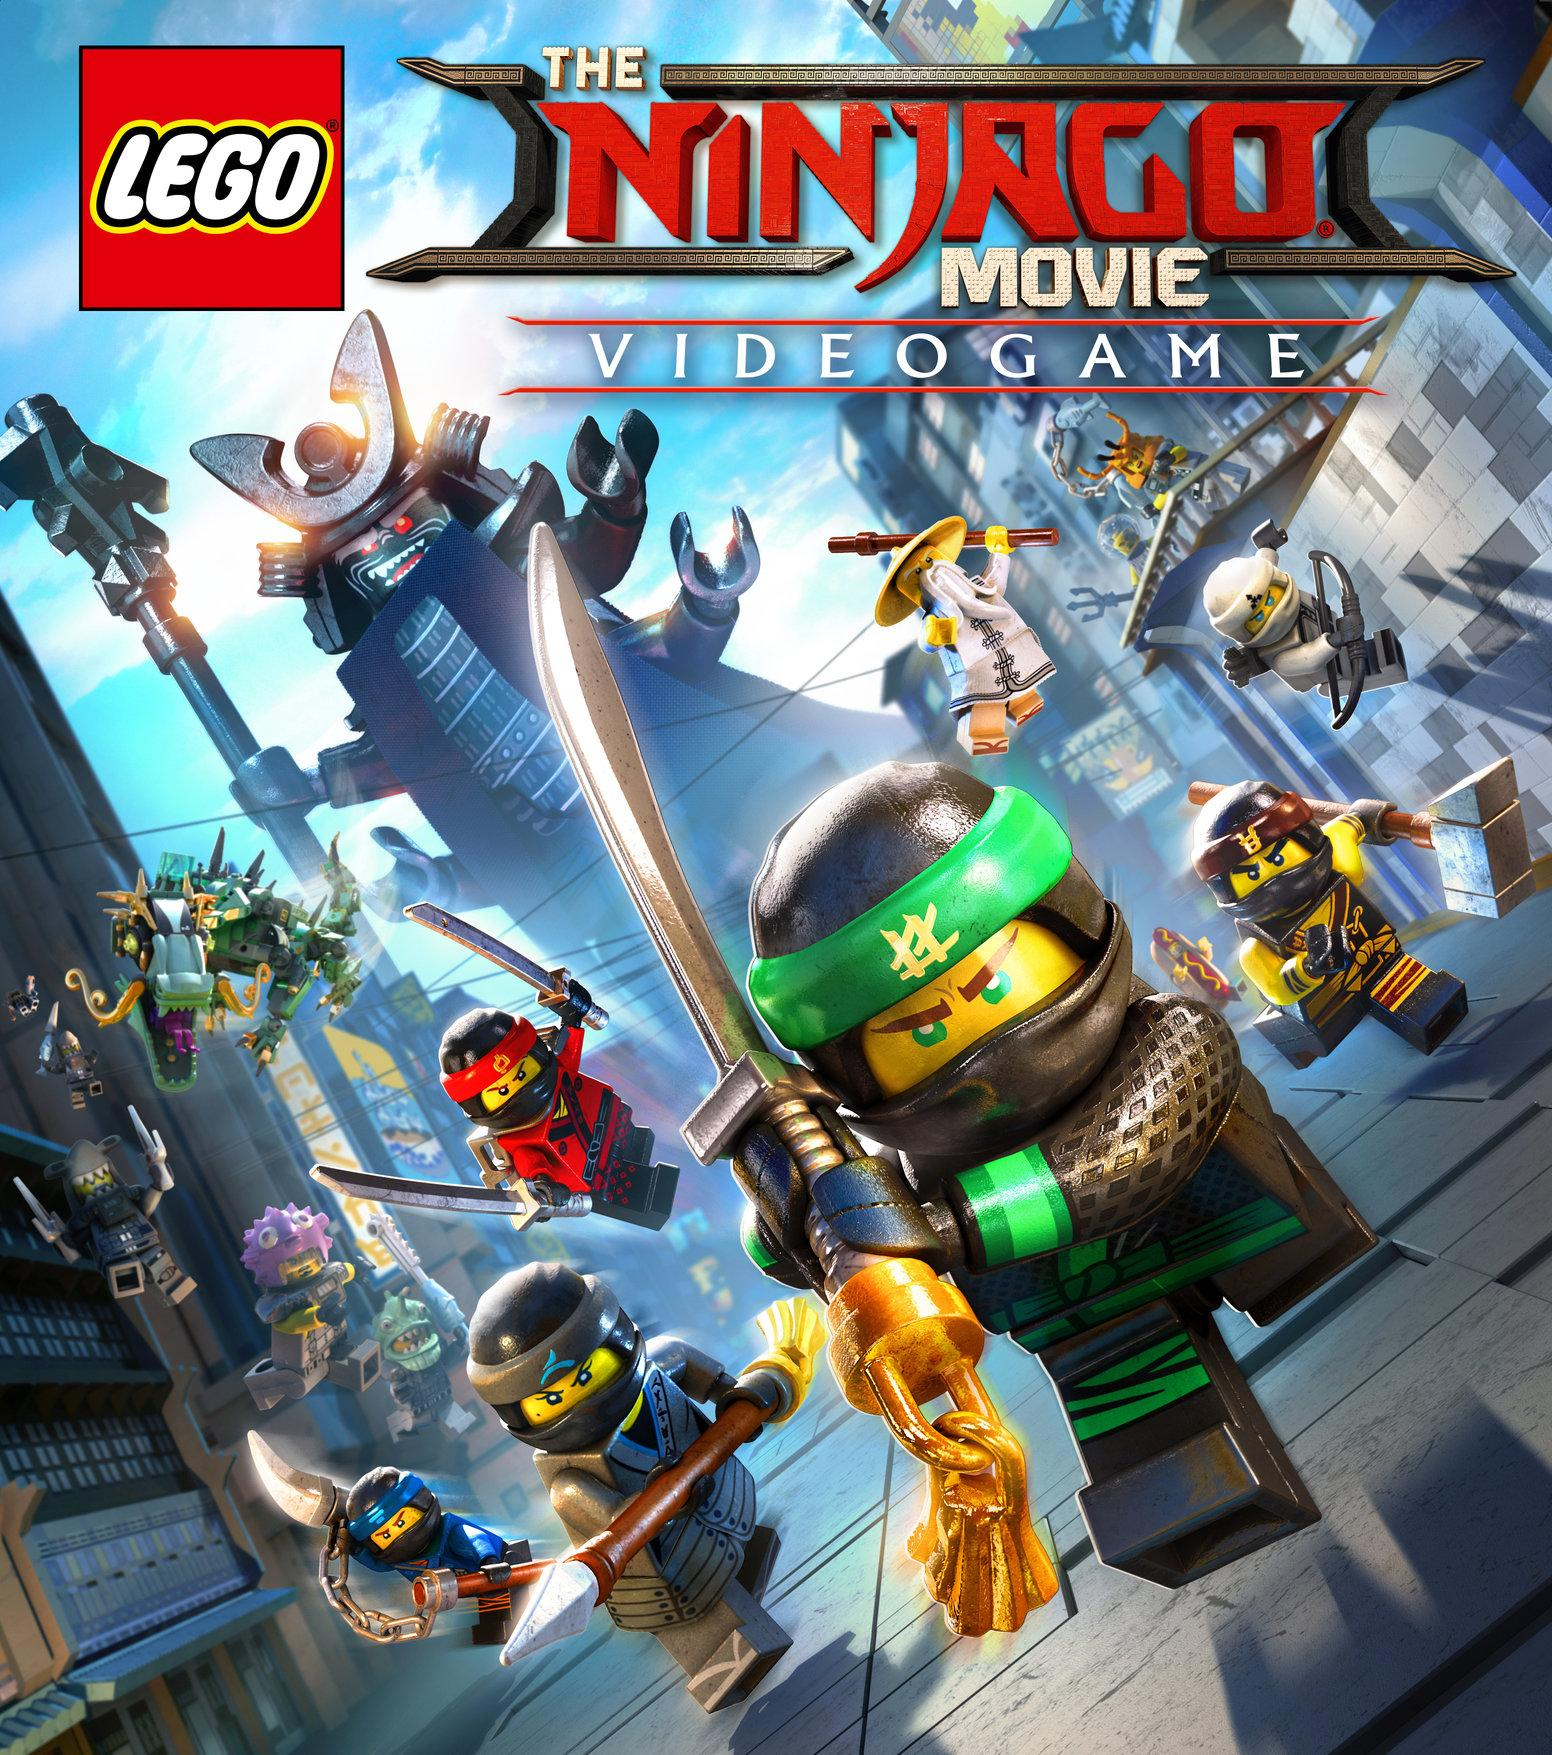 LEGO Ninjago Movie Game Videogame: Amazon co uk: PC & Video